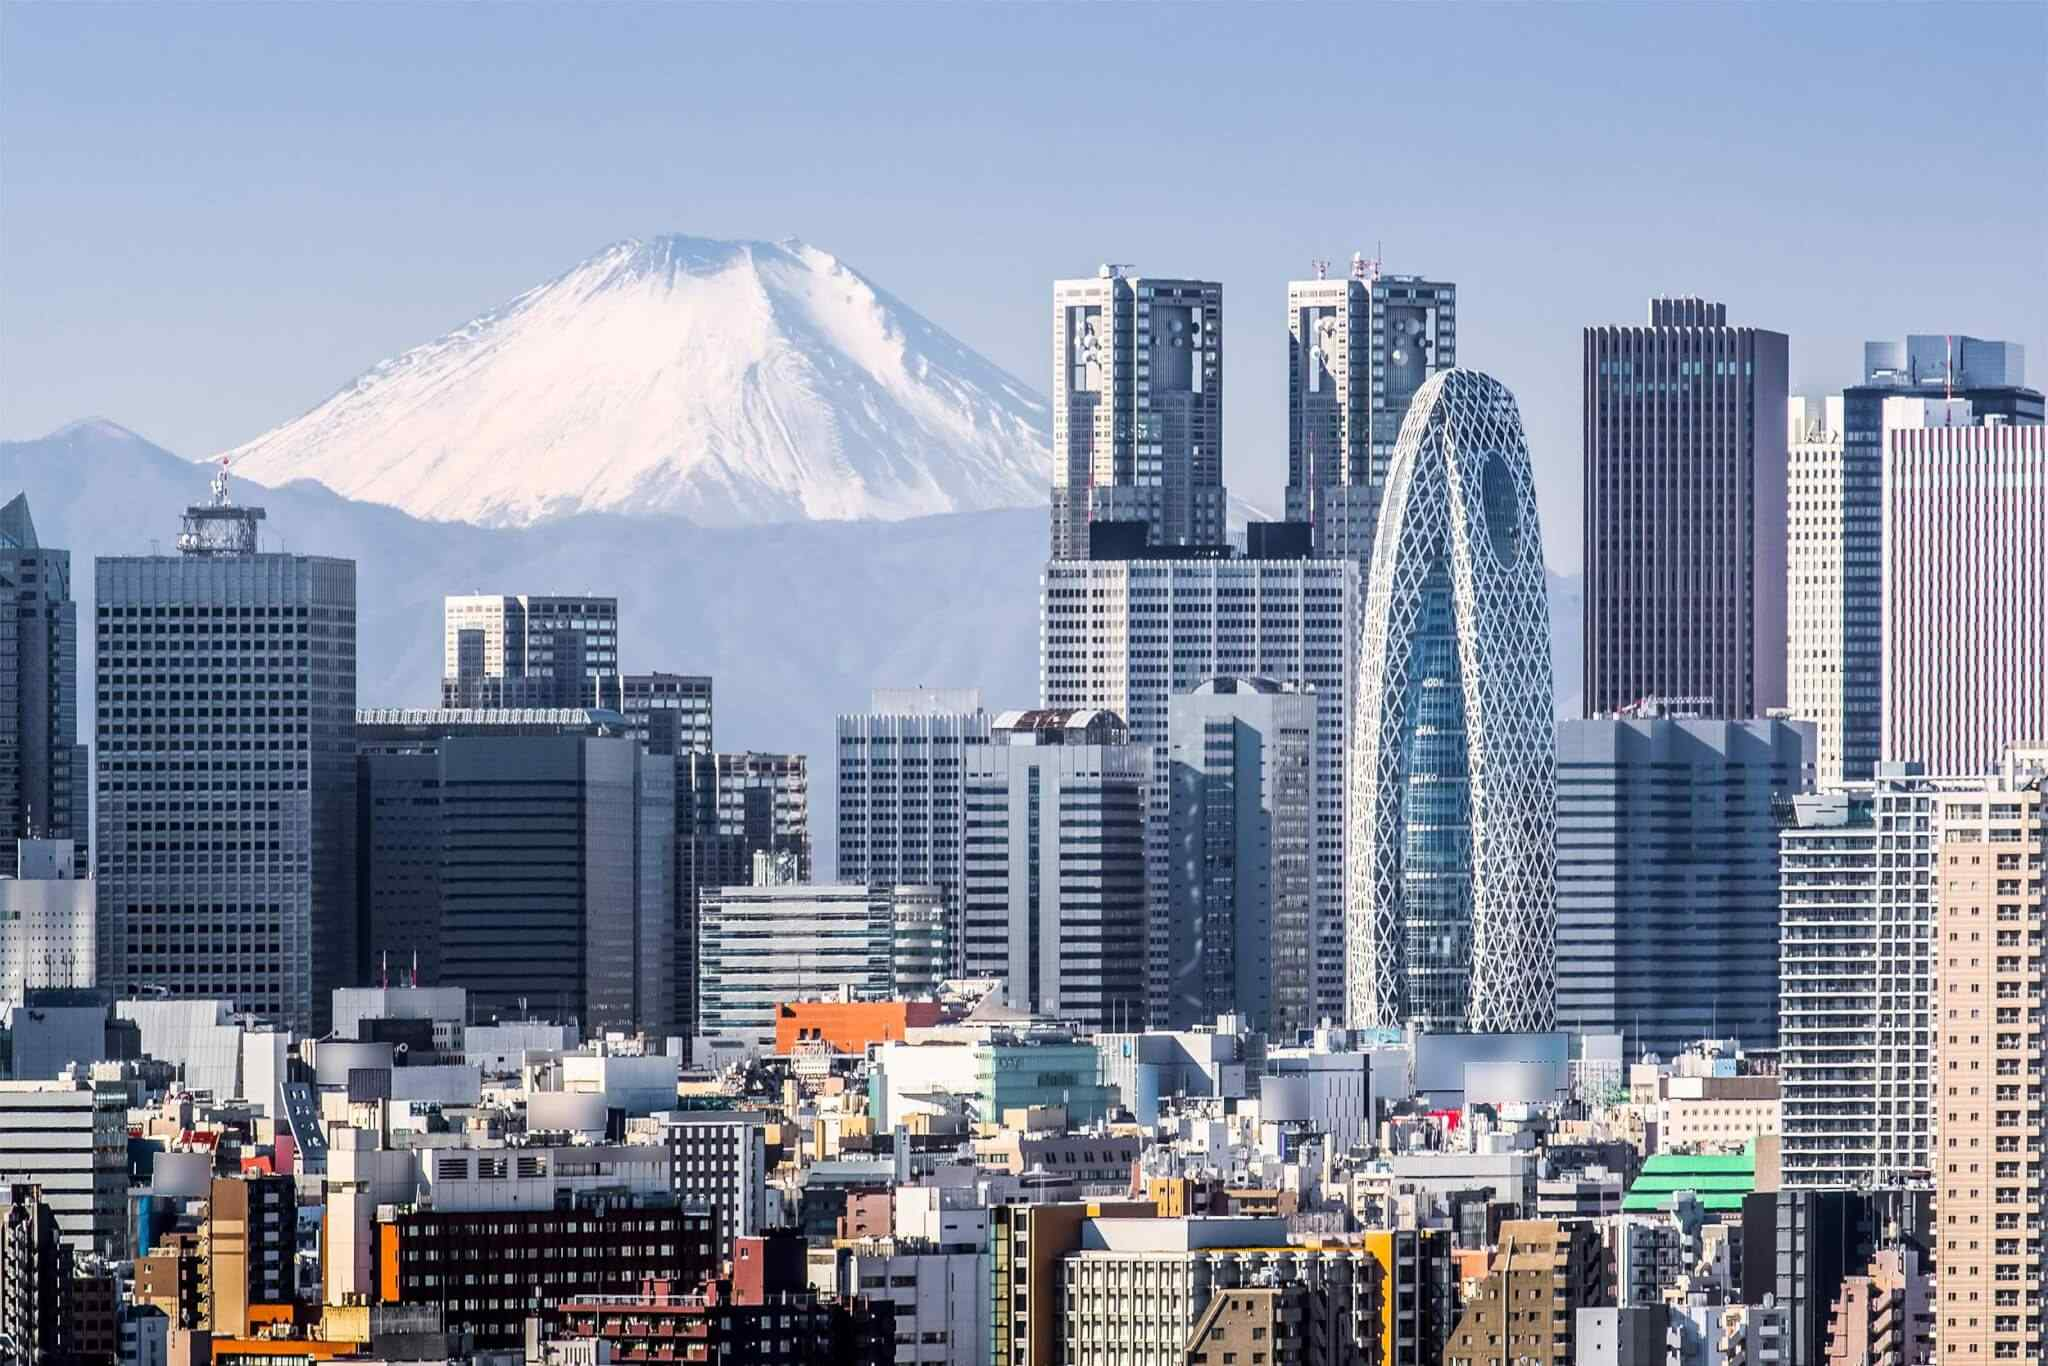 https://www.banitours.com/wp-content/uploads/2018/09/destination-tokyo-02.jpg